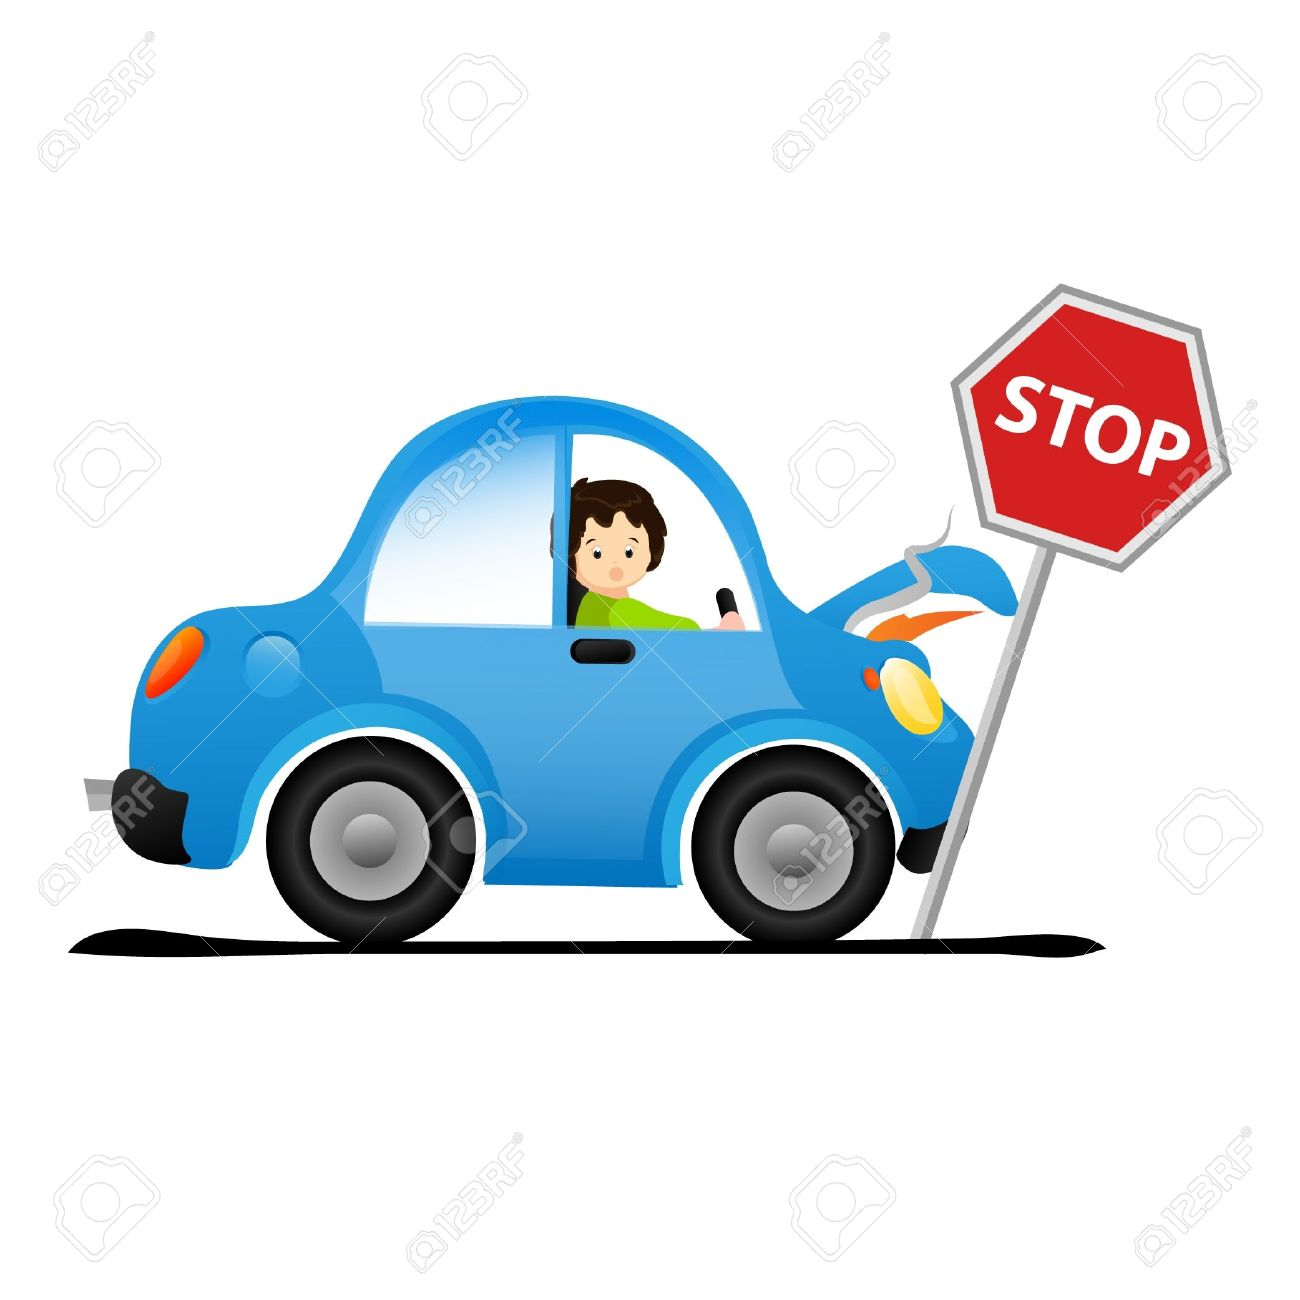 Emergency stop icon clipart emergency off - Emergency Stop Car Crash Illustration